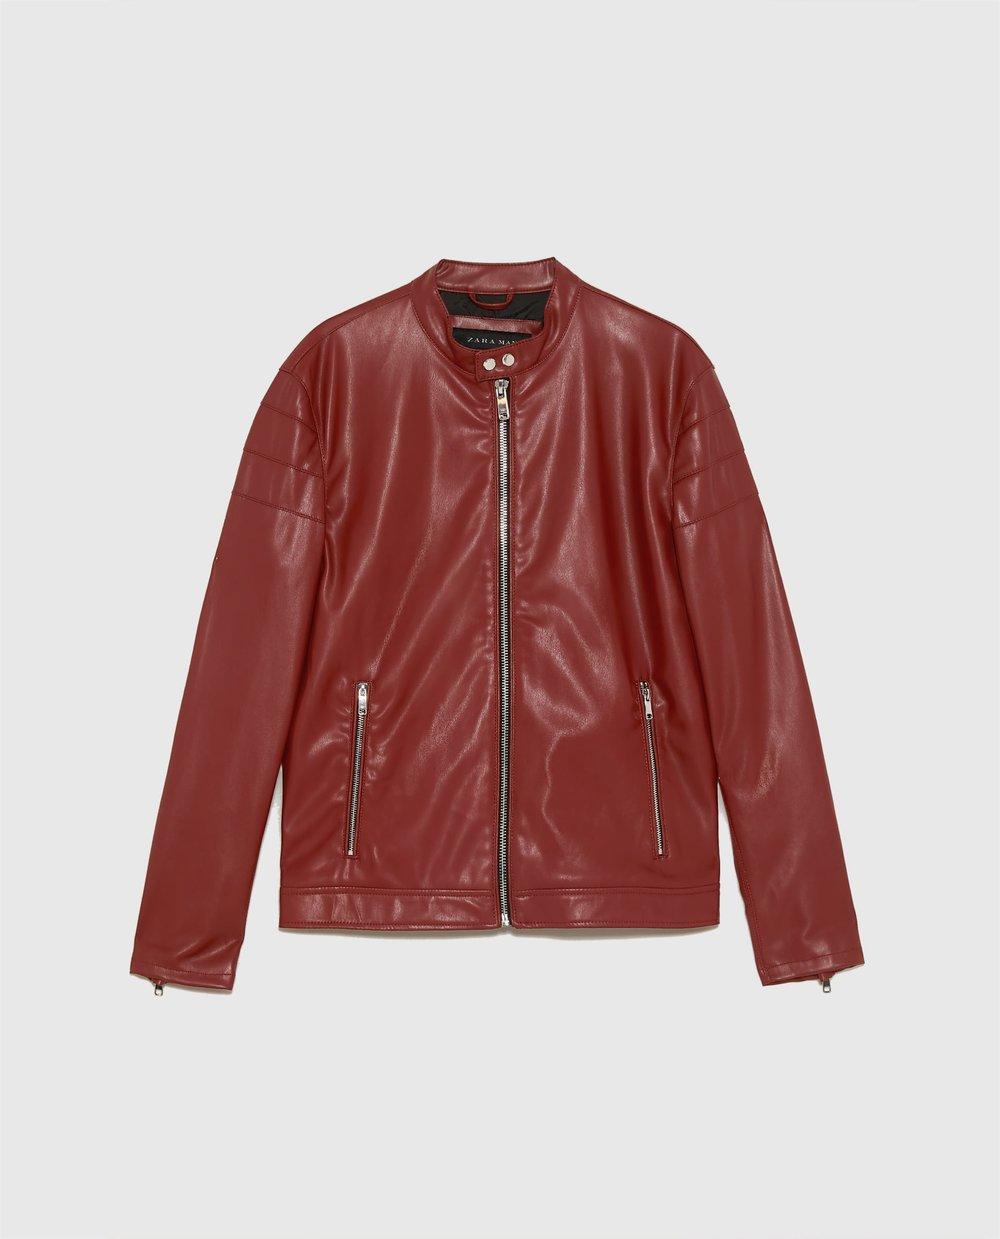 Red leather biker jacket - £49.99 at Zara